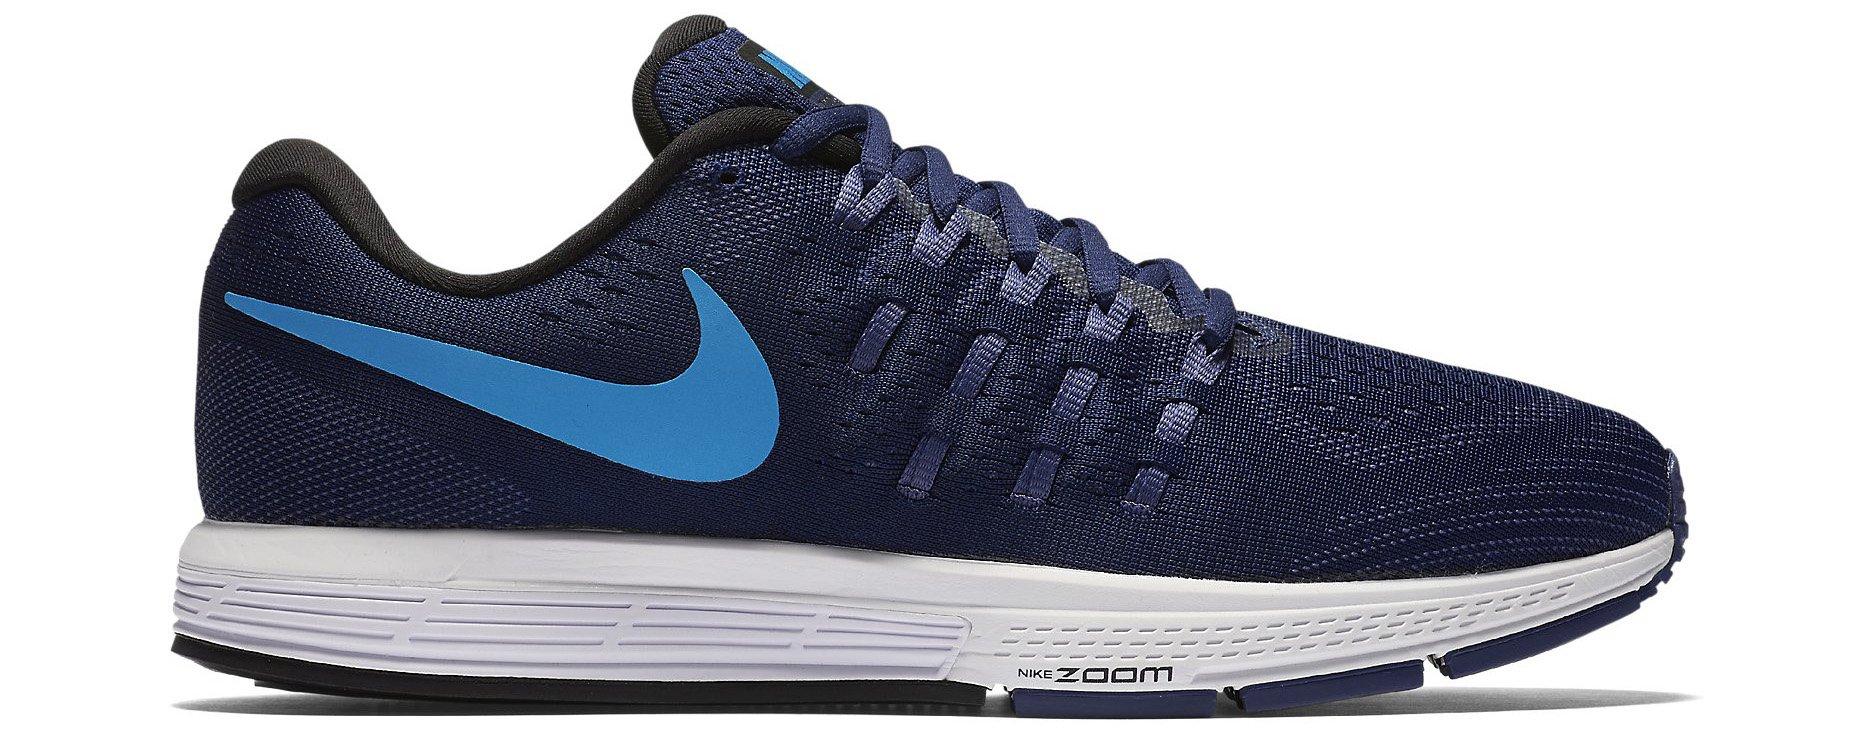 Pánské běžecké boty Nike Air Zoom Vomero 11 9d37fd9365